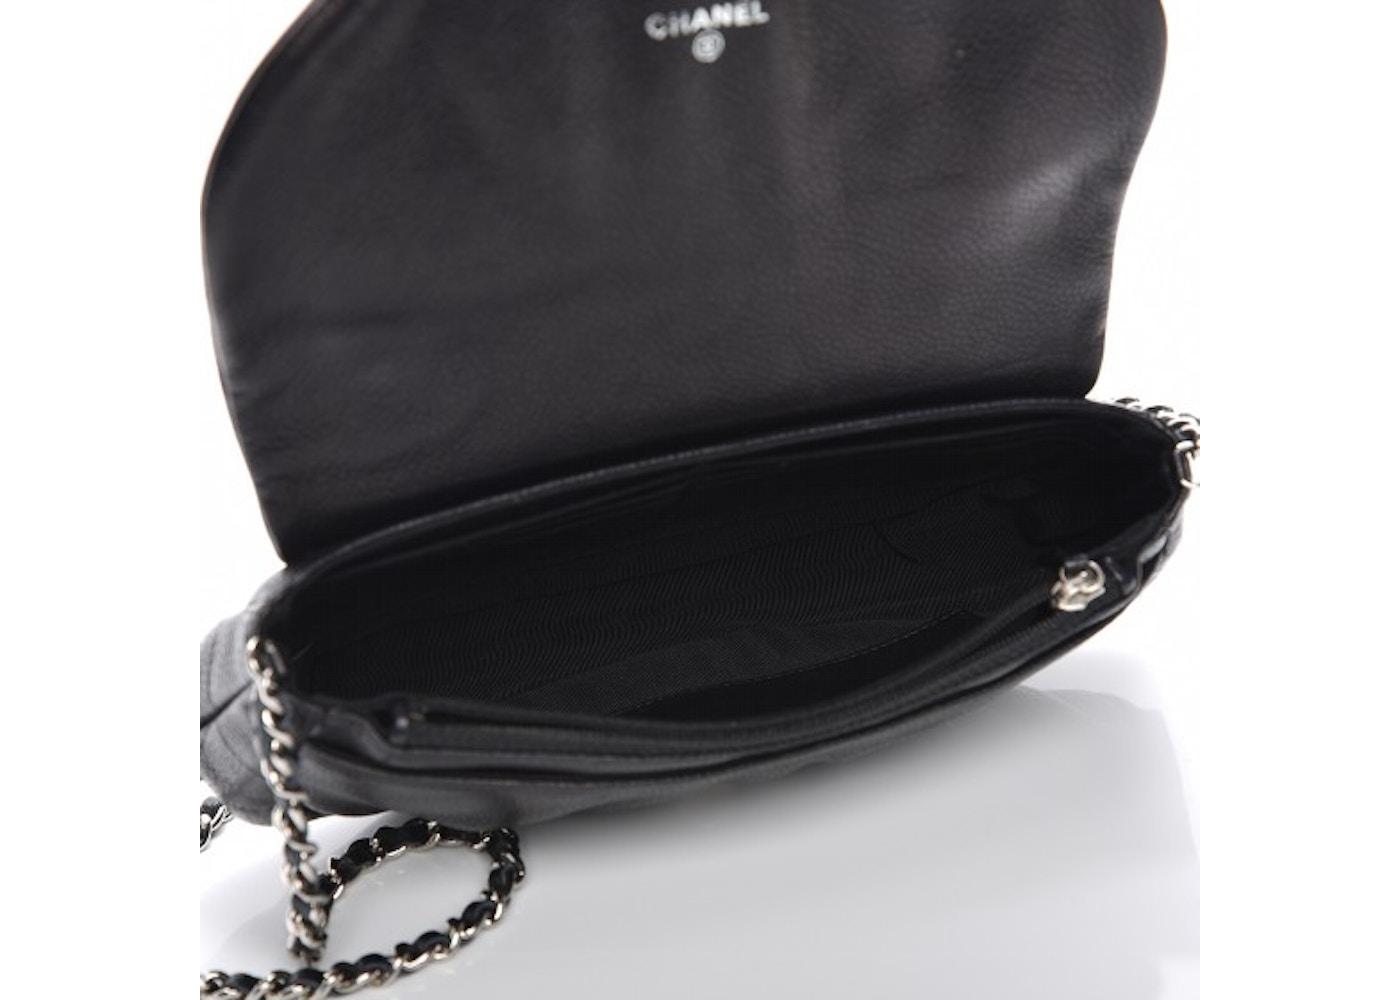 edb8f6988861 Chanel Half Moon Wallet On Chain Black